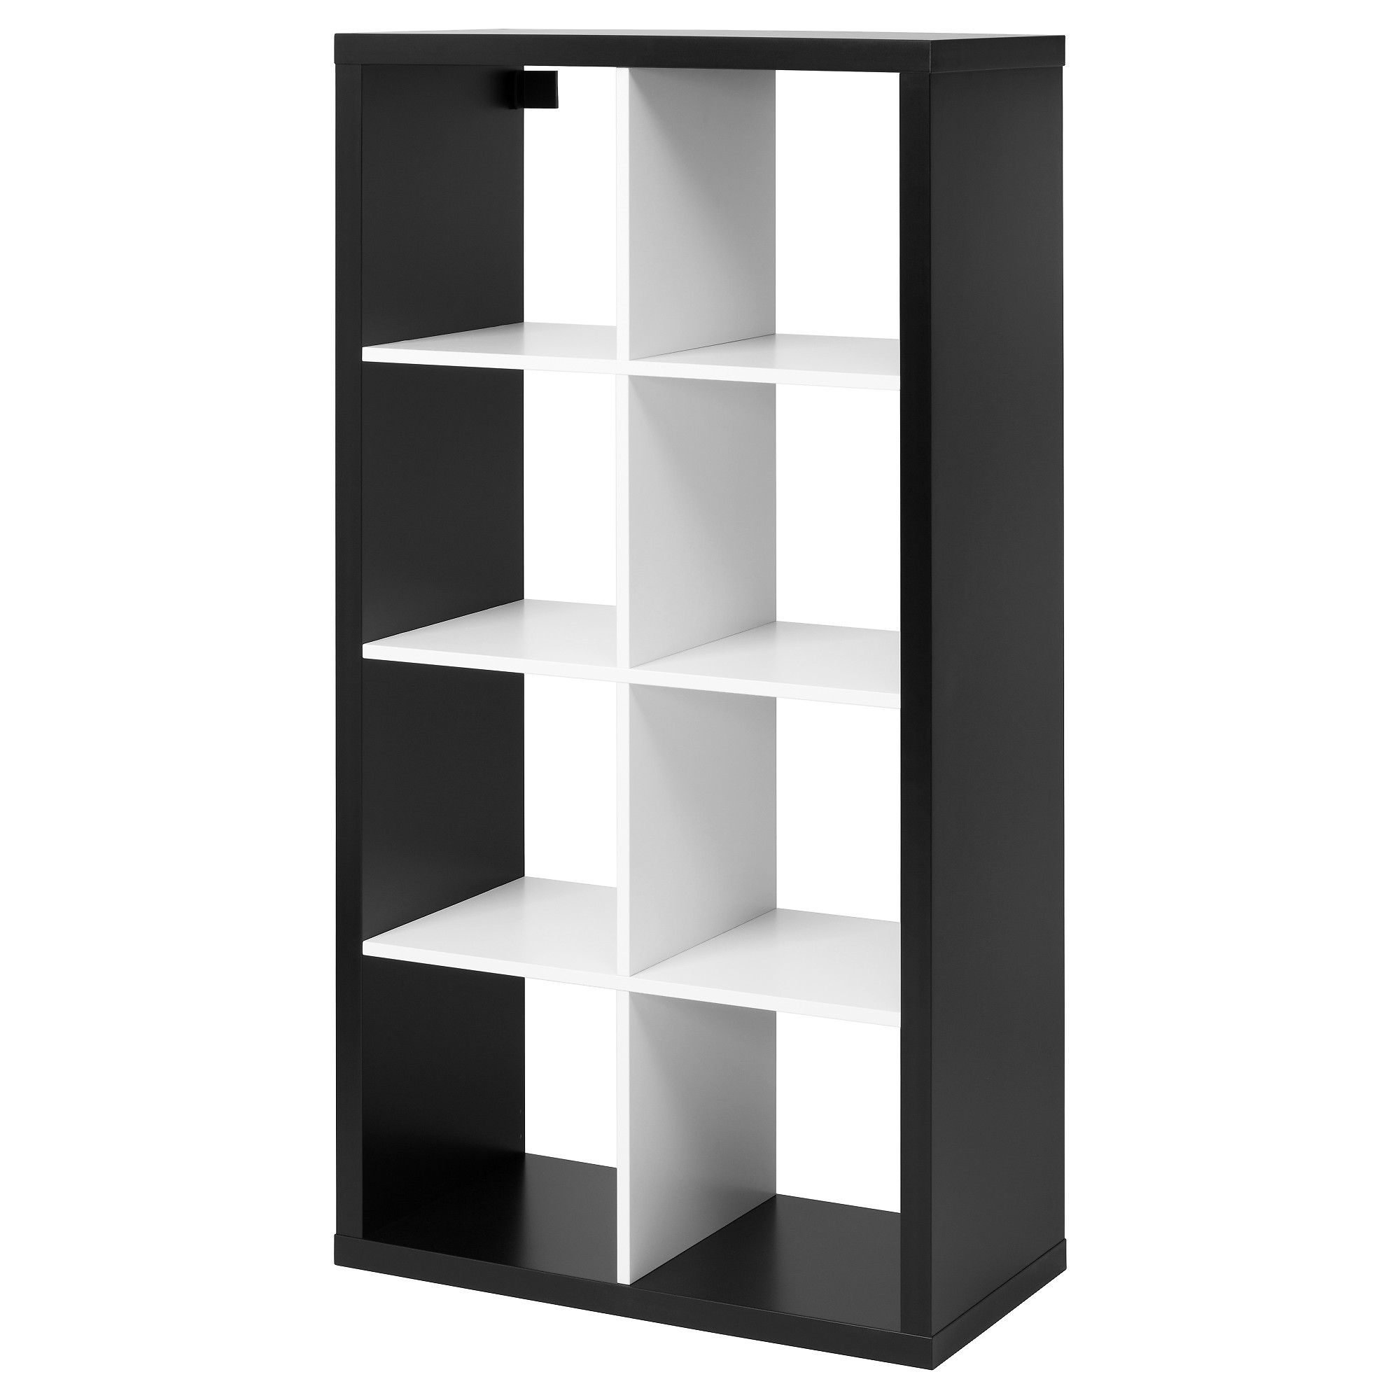 Carrelage Salle De Bain Pierre Bleue ~ kallax tag re noir blanc 77 x 147 cm ikea